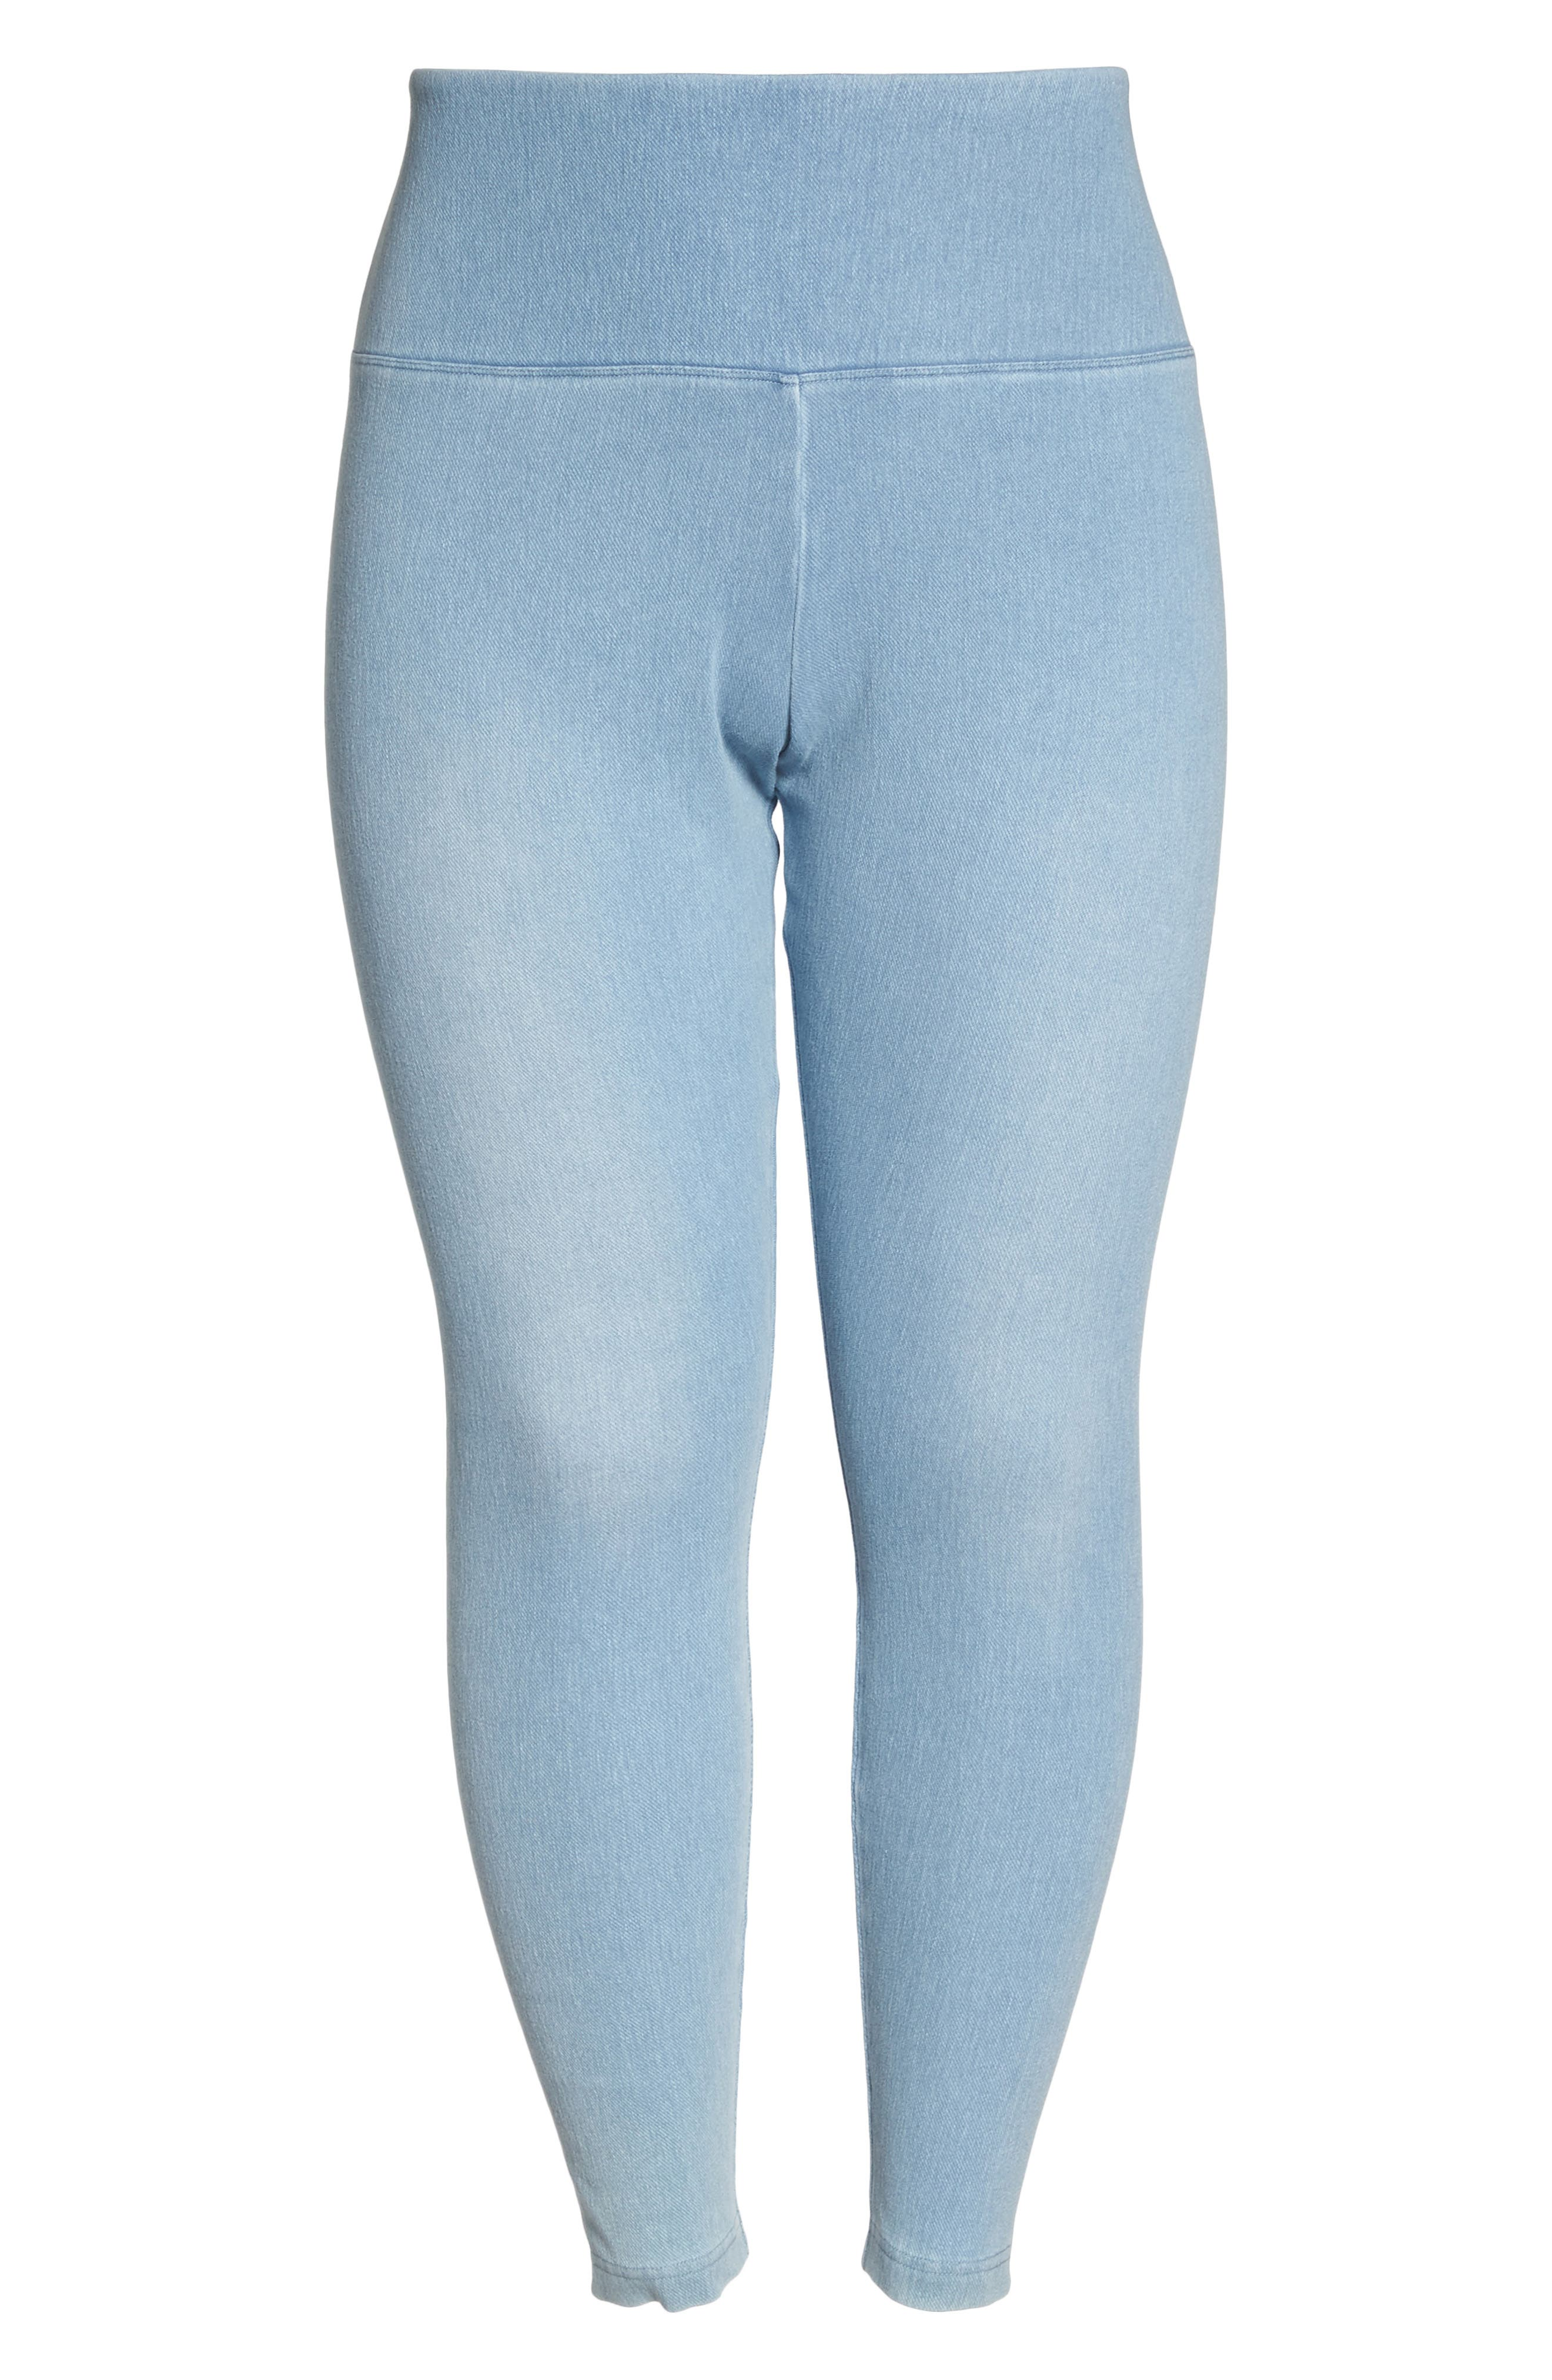 Stretch Denim Leggings,                             Alternate thumbnail 6, color,                             Cashmere Blue